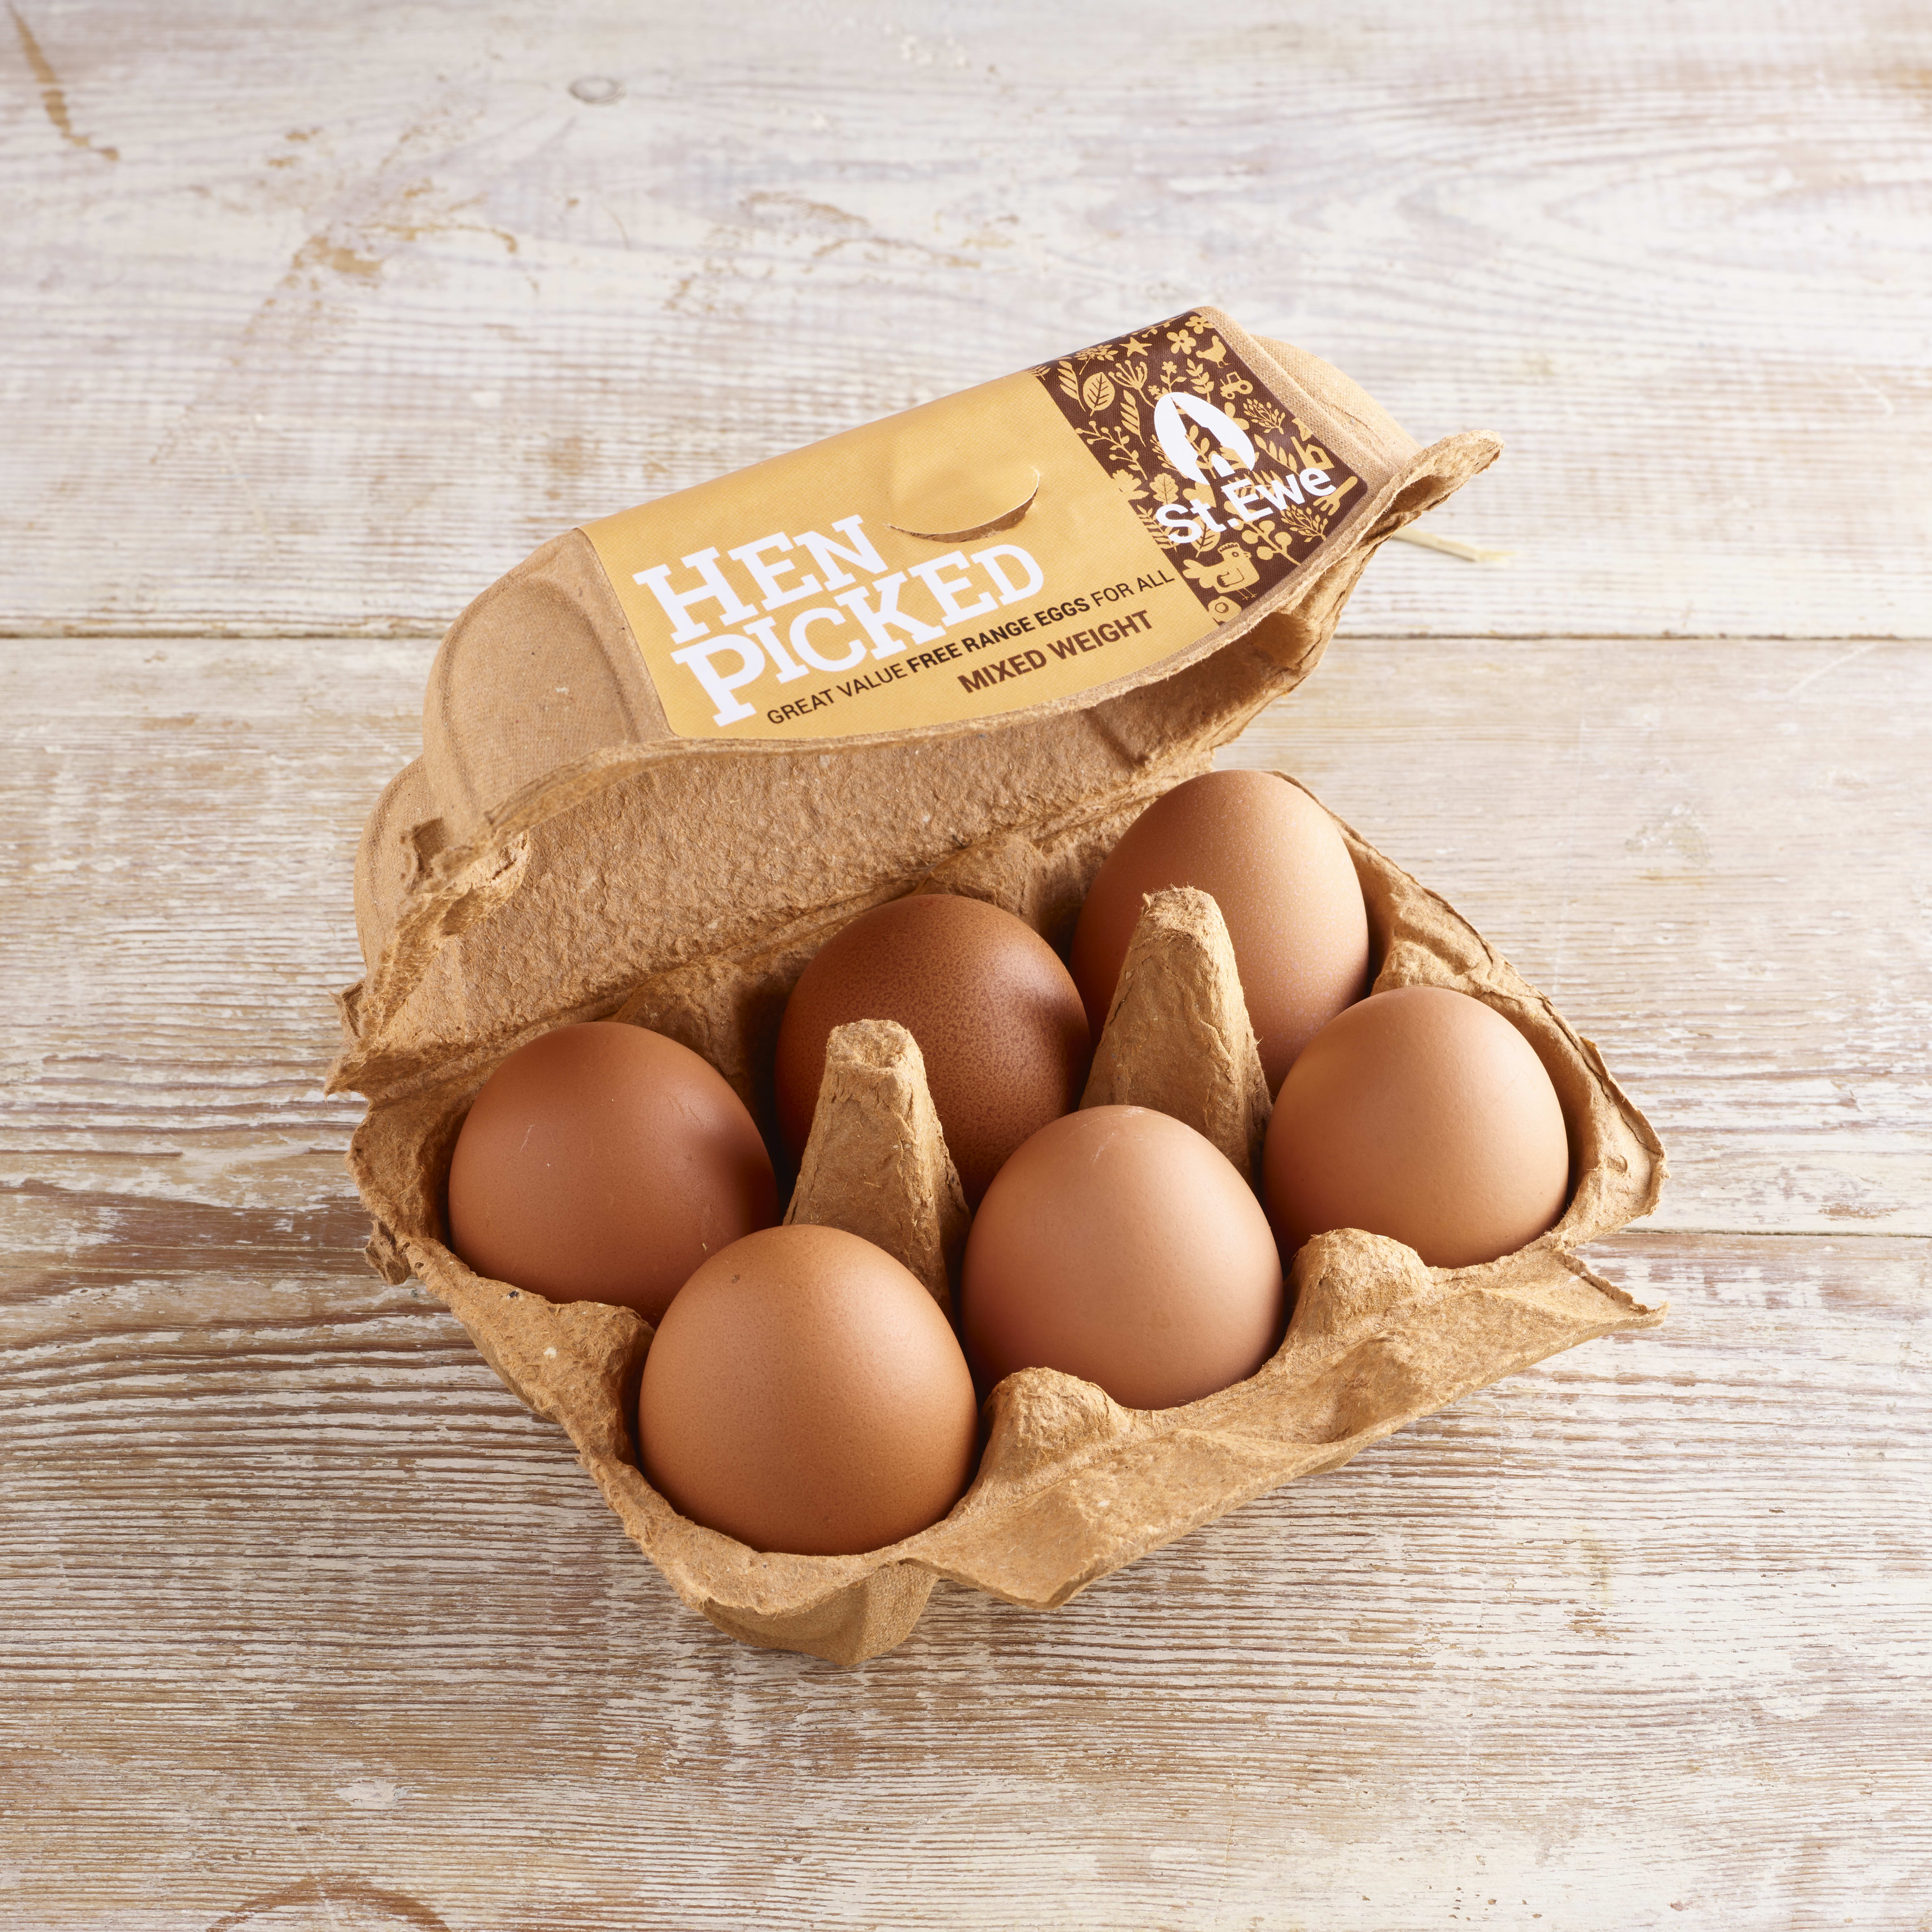 St Ewe Hen Picked Westcountry Free-Range Eggs              mixed weight